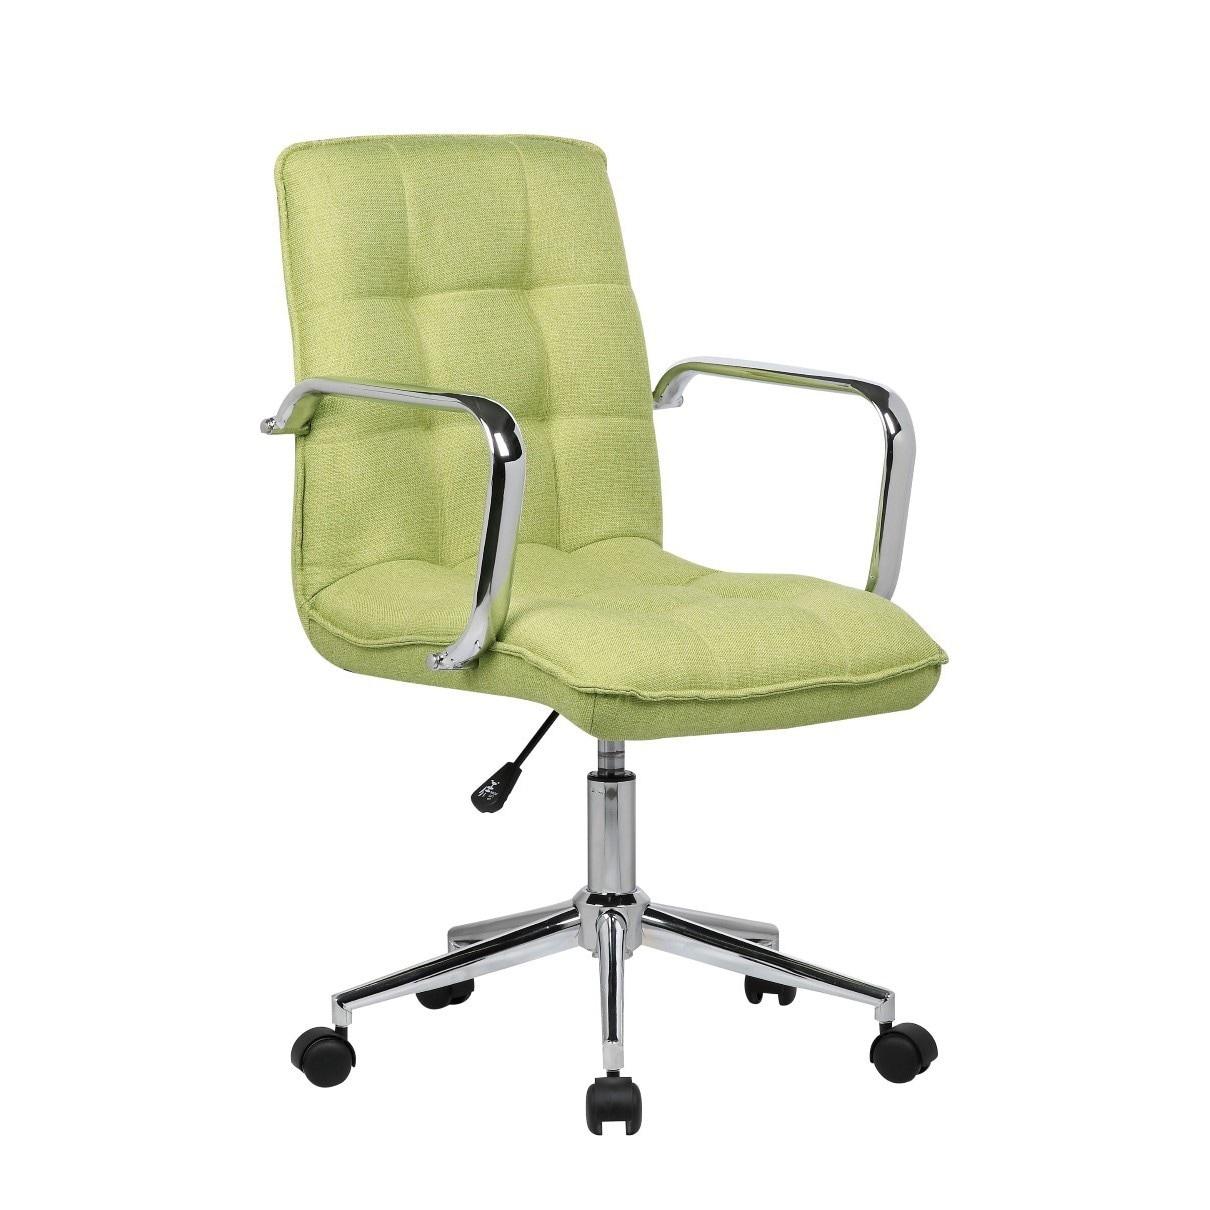 Fancy Wheeled Shower Chair Pictures - Bathtub Design Ideas - valtak.com